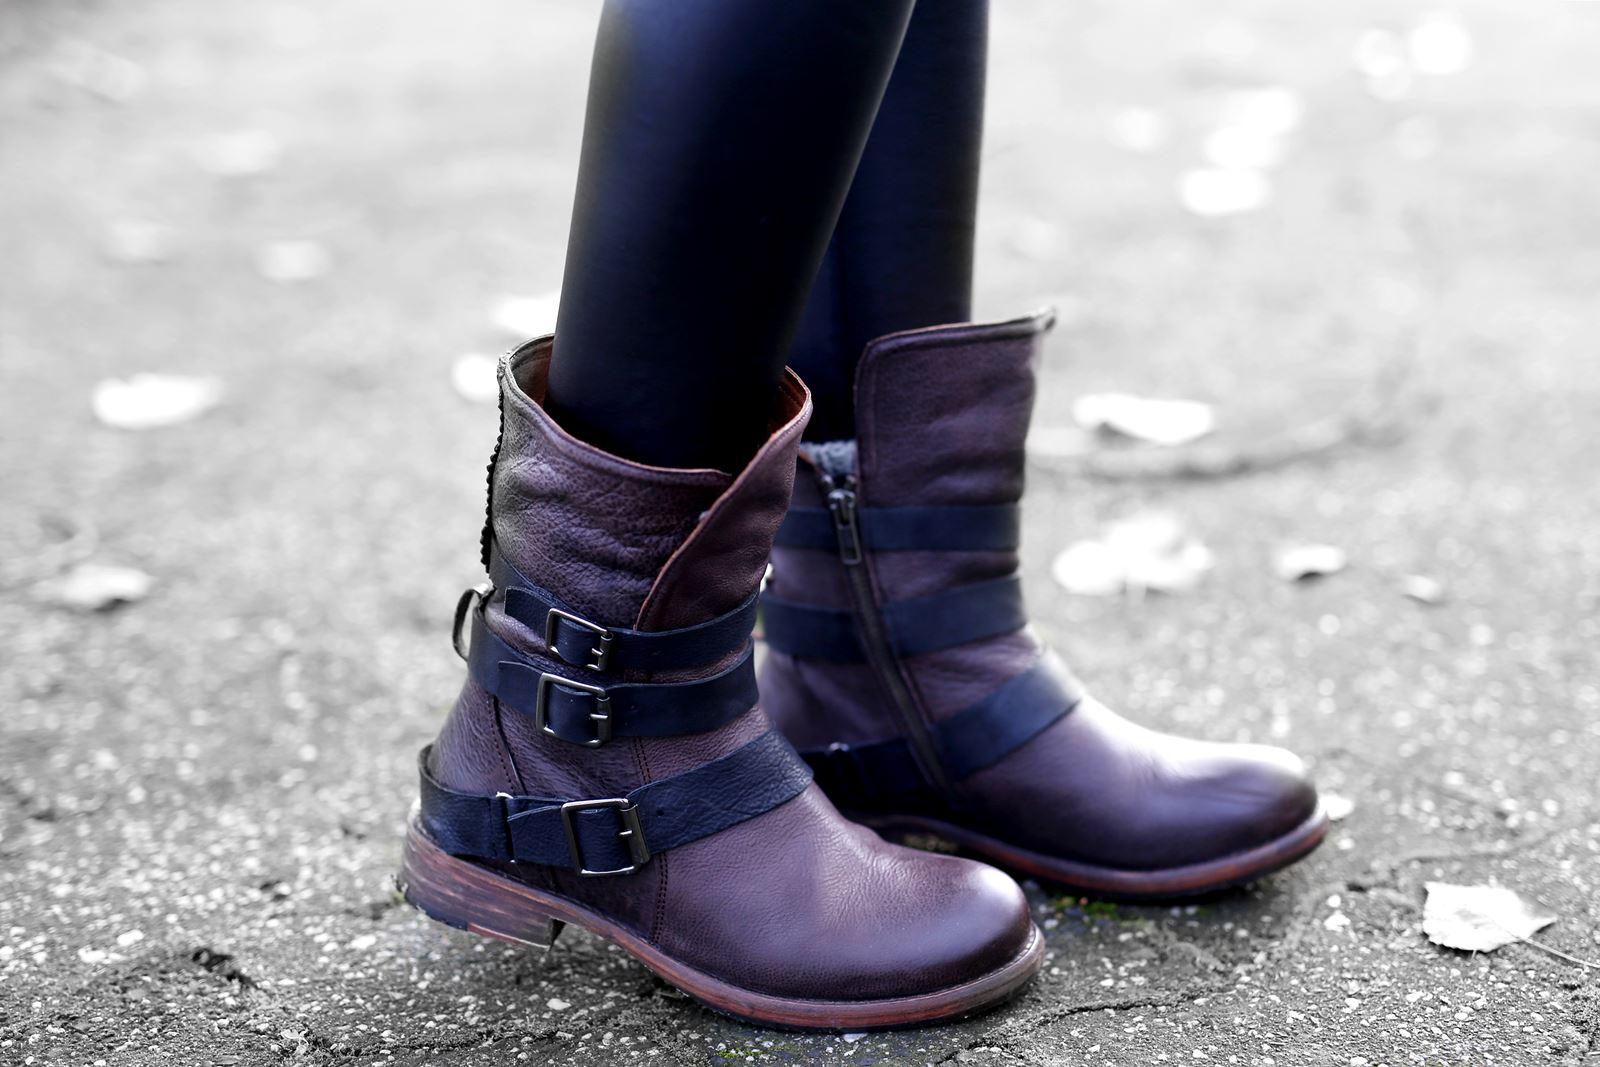 modeblog-german-fashion-blog-herbst-outfit-poncho-xxl-schal-10